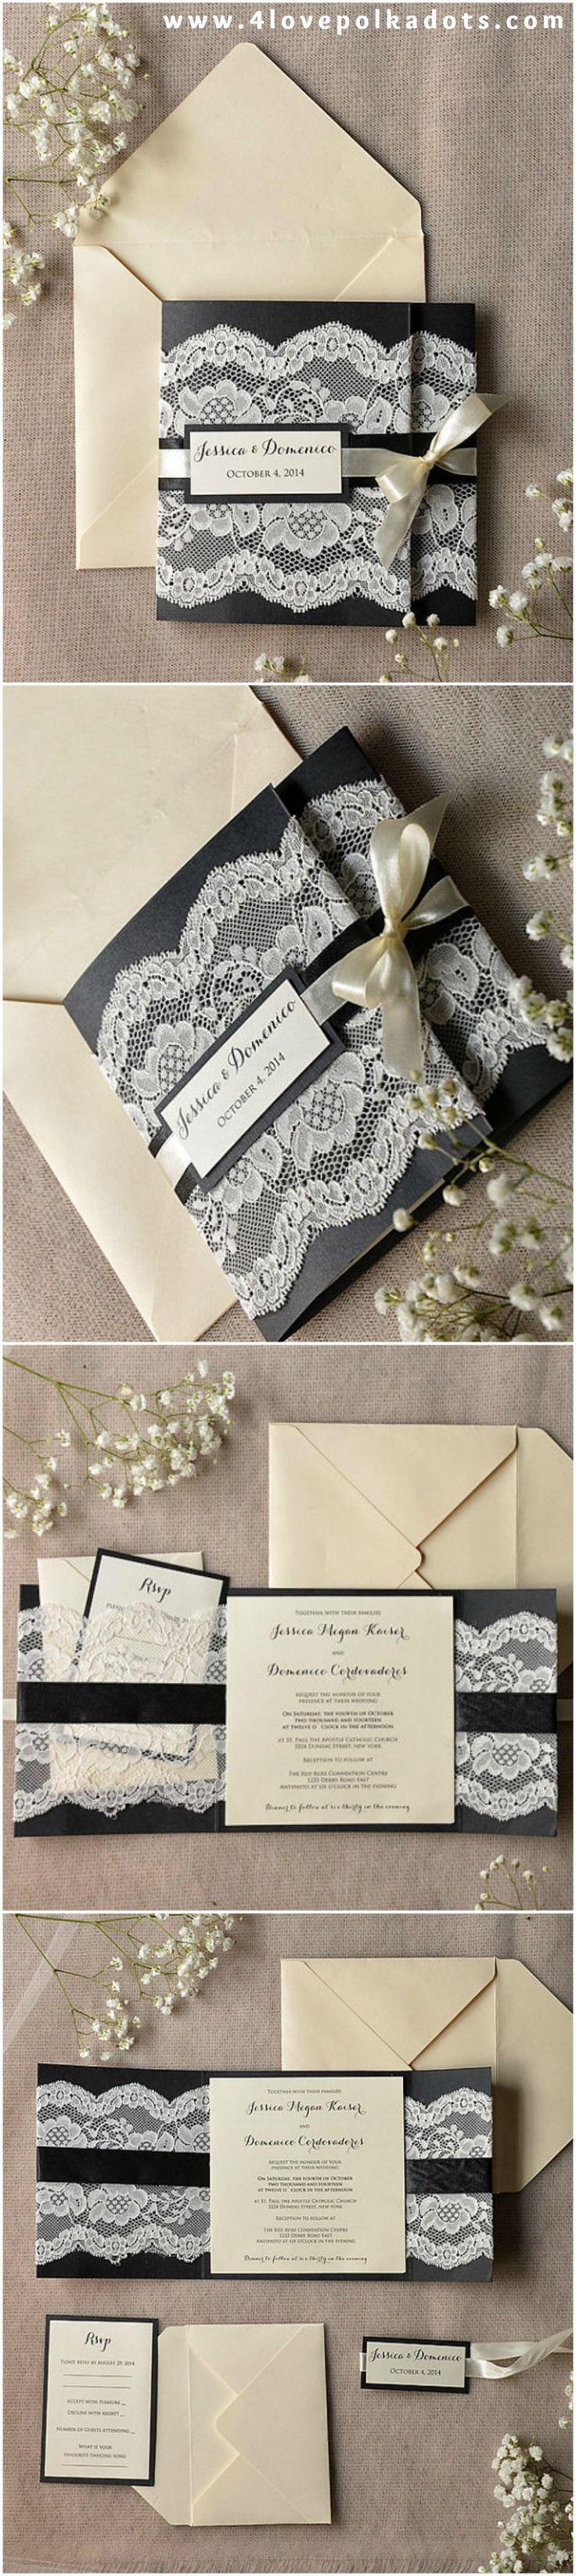 Black Romantic Lace Wedding Invitations #elegant #romantic #black #blackwedding #weddingideas #dpf